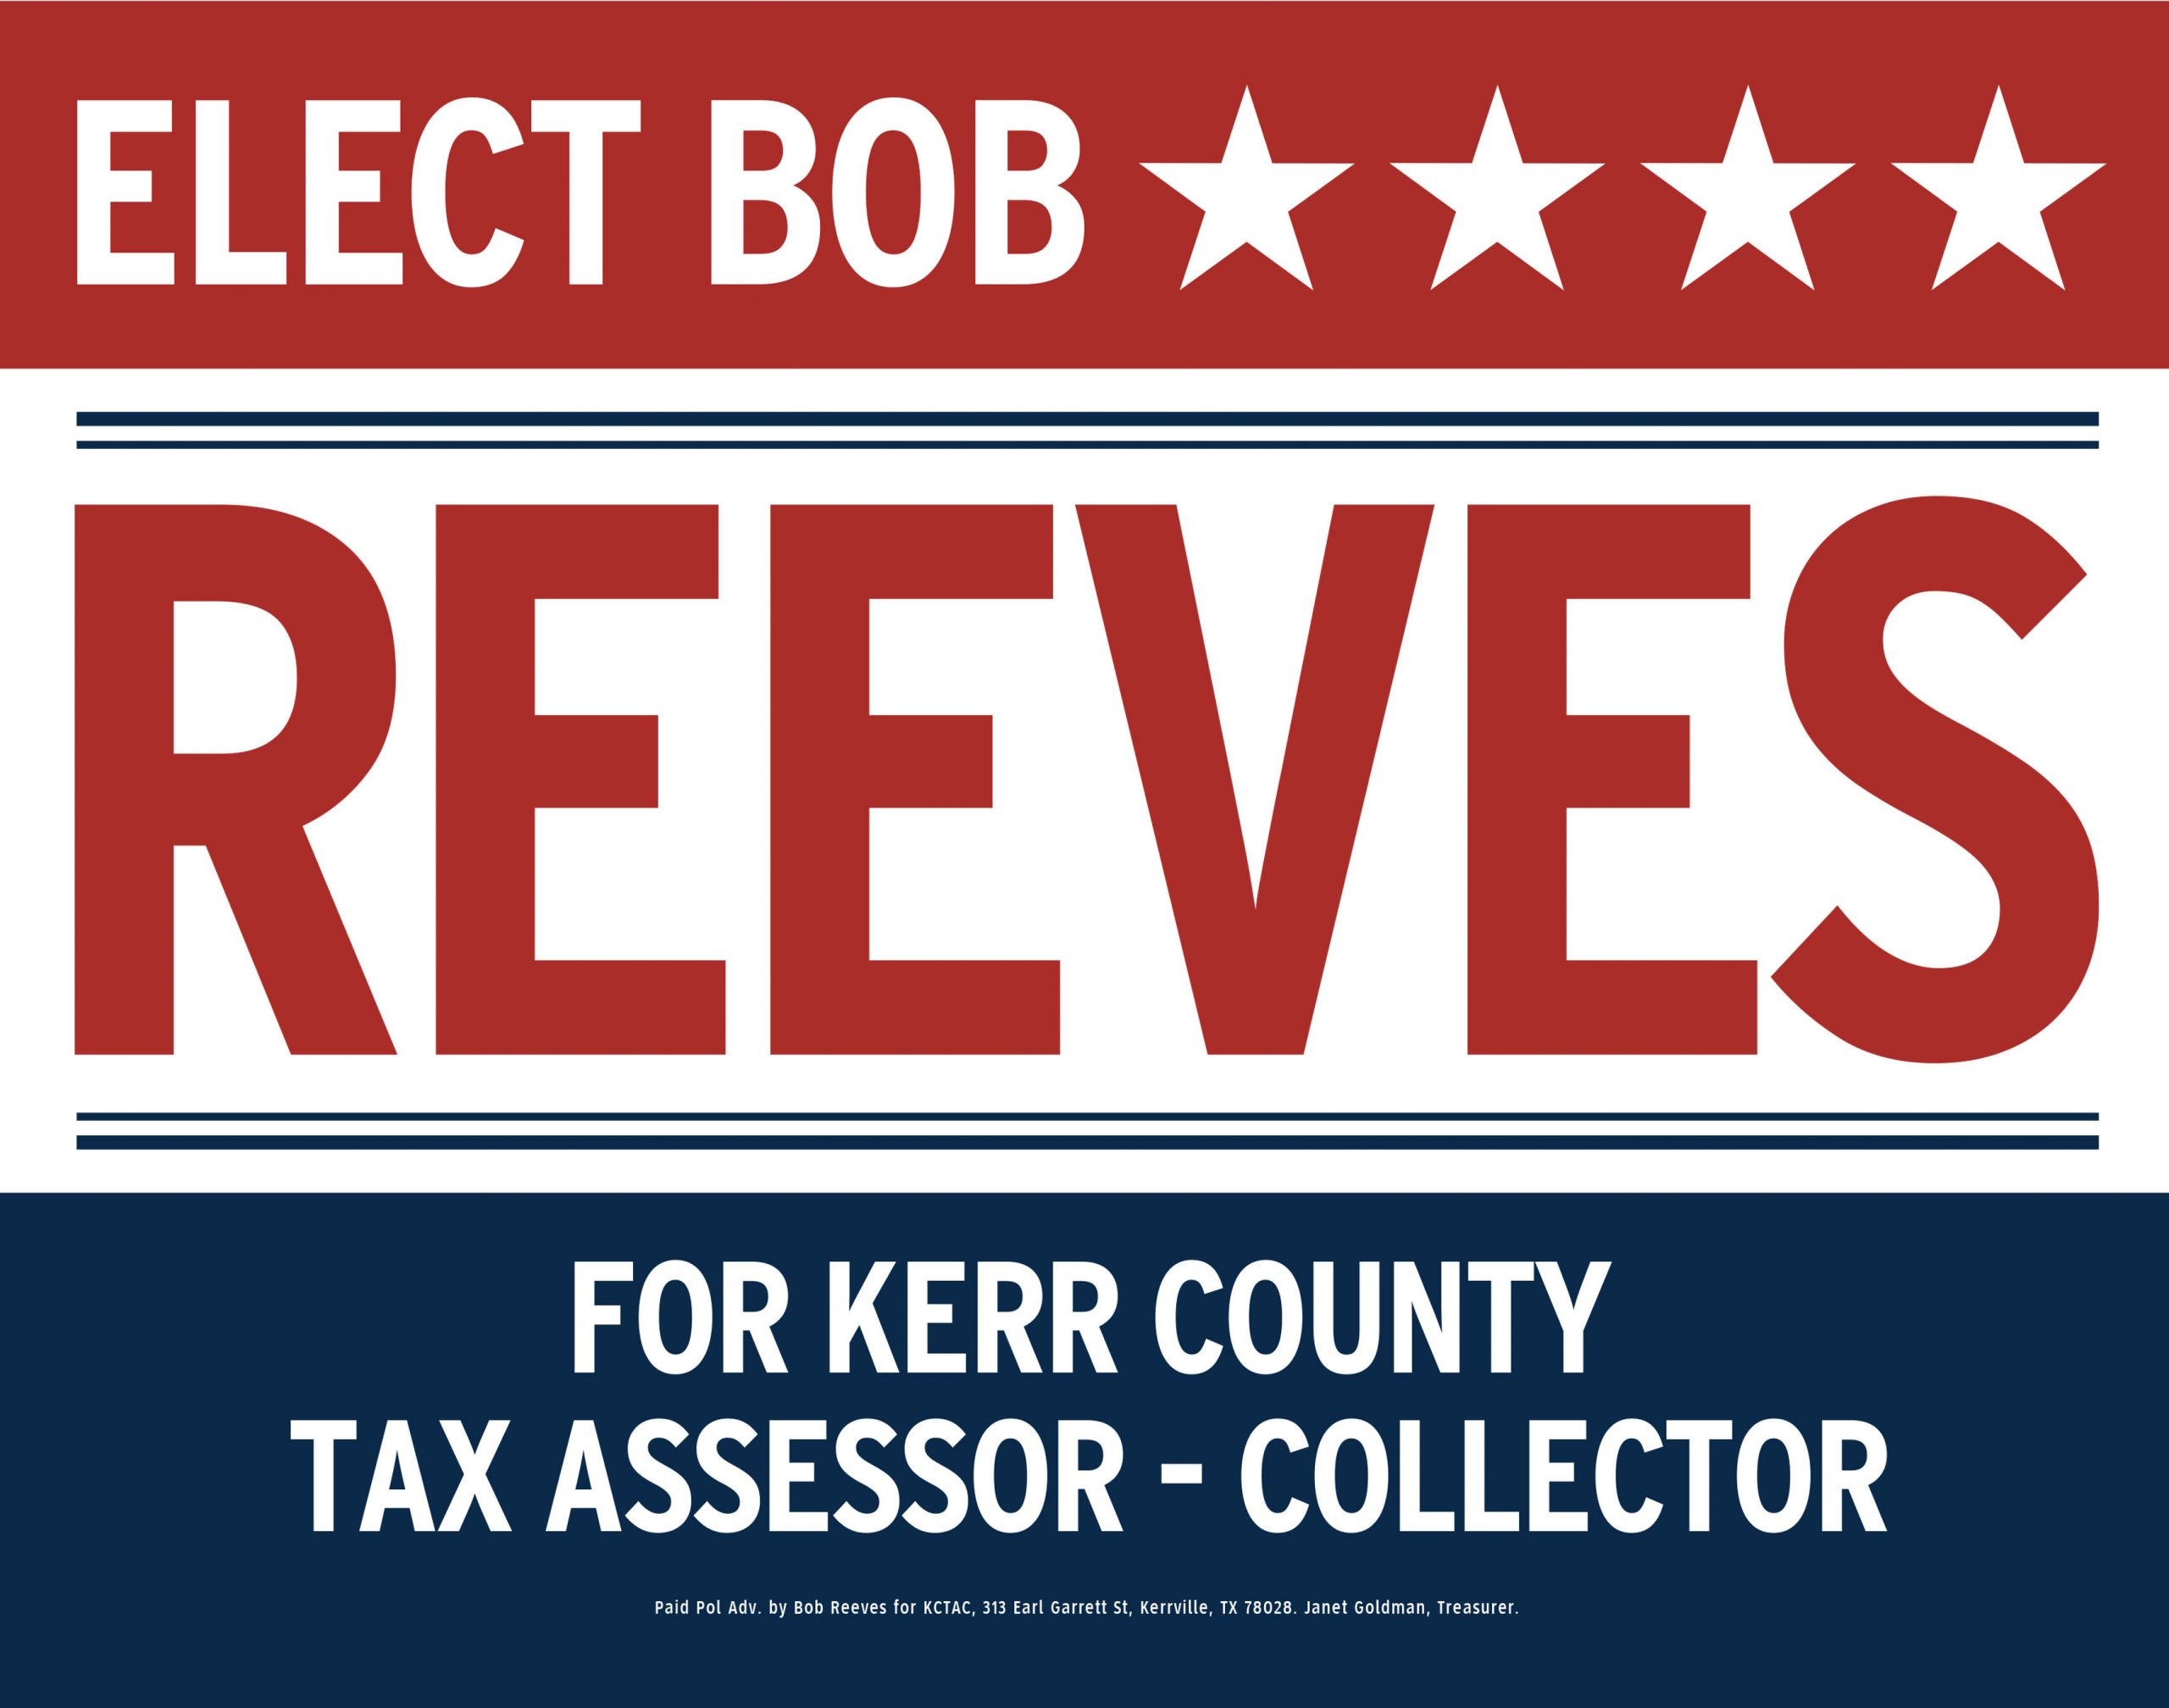 Elect Bob Reeves